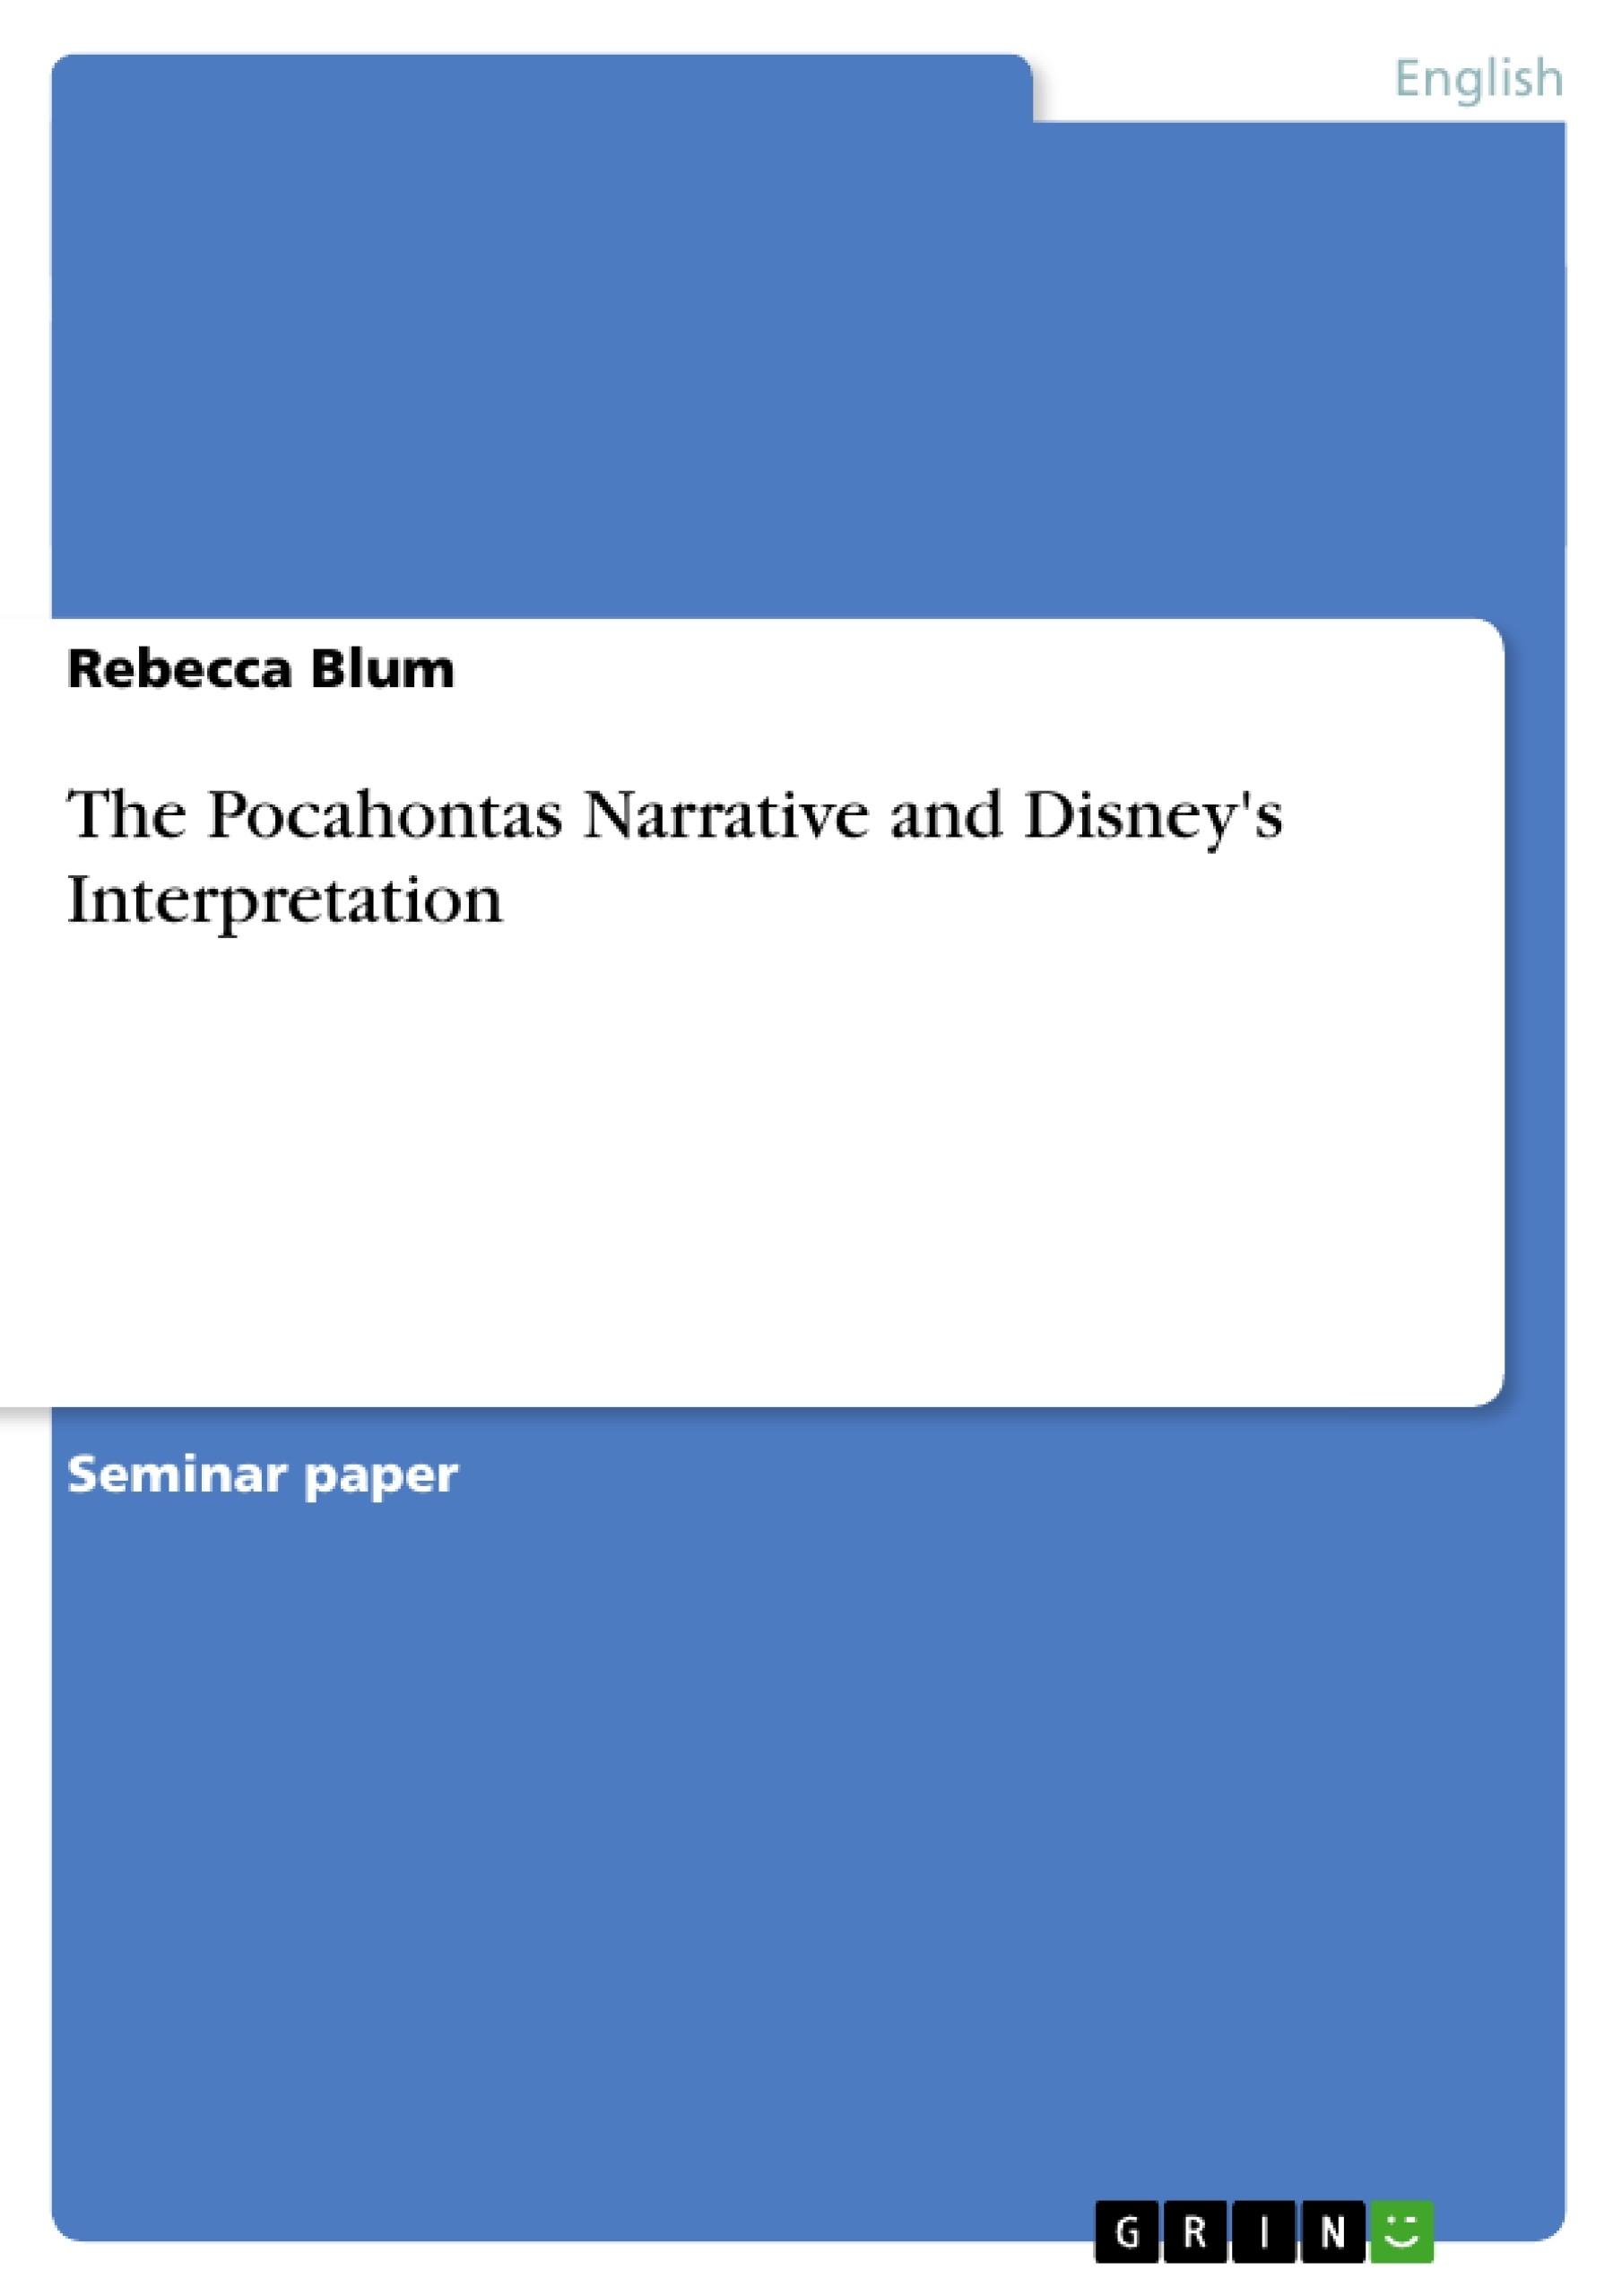 Title: The Pocahontas Narrative and Disney's Interpretation